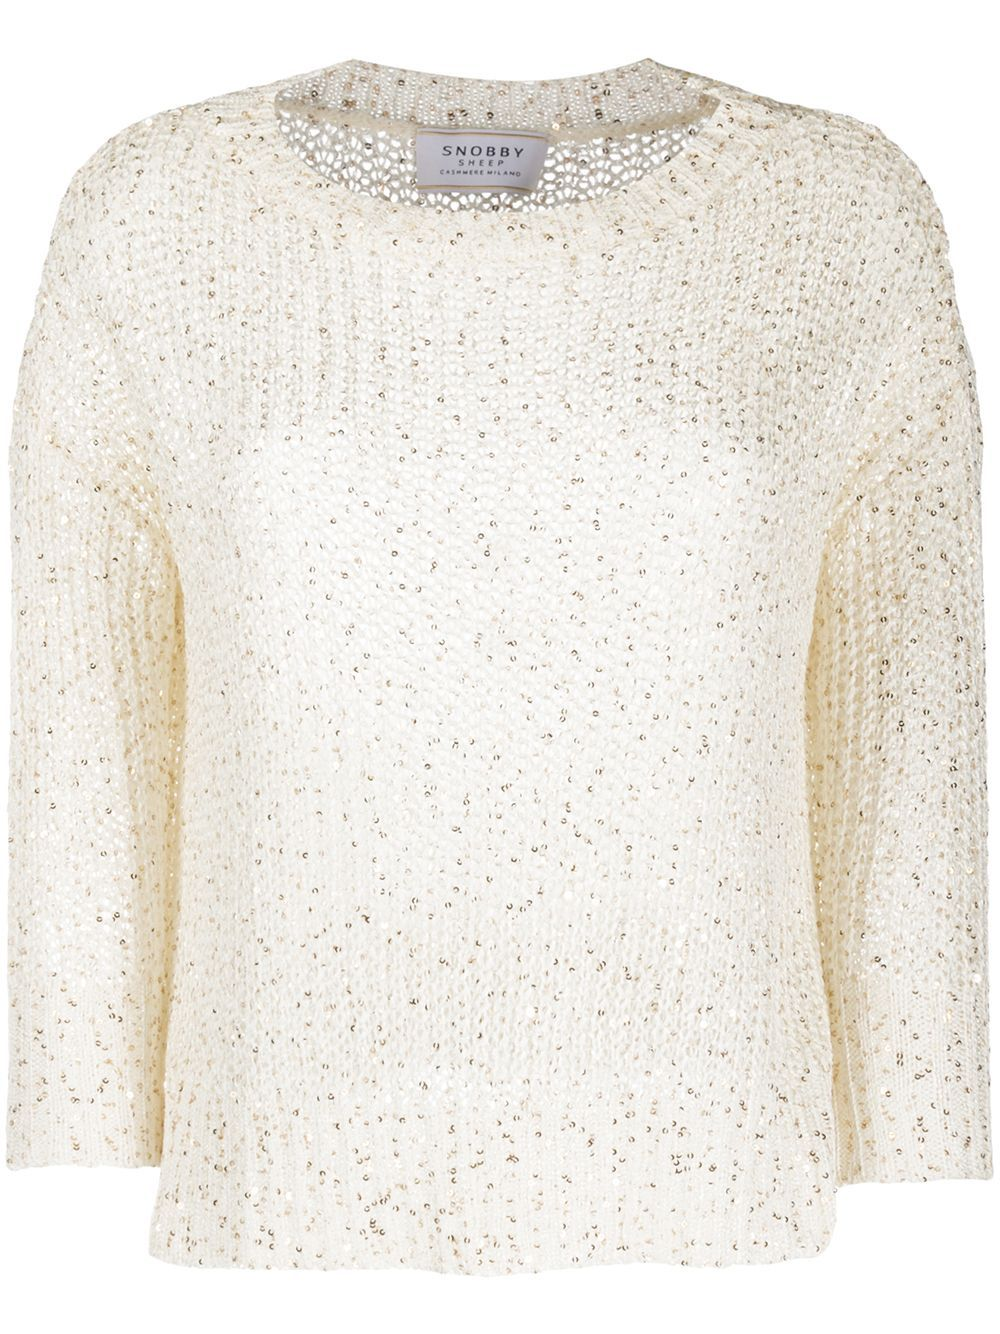 Snobby Sheep crew neck chunky knit jumper - White